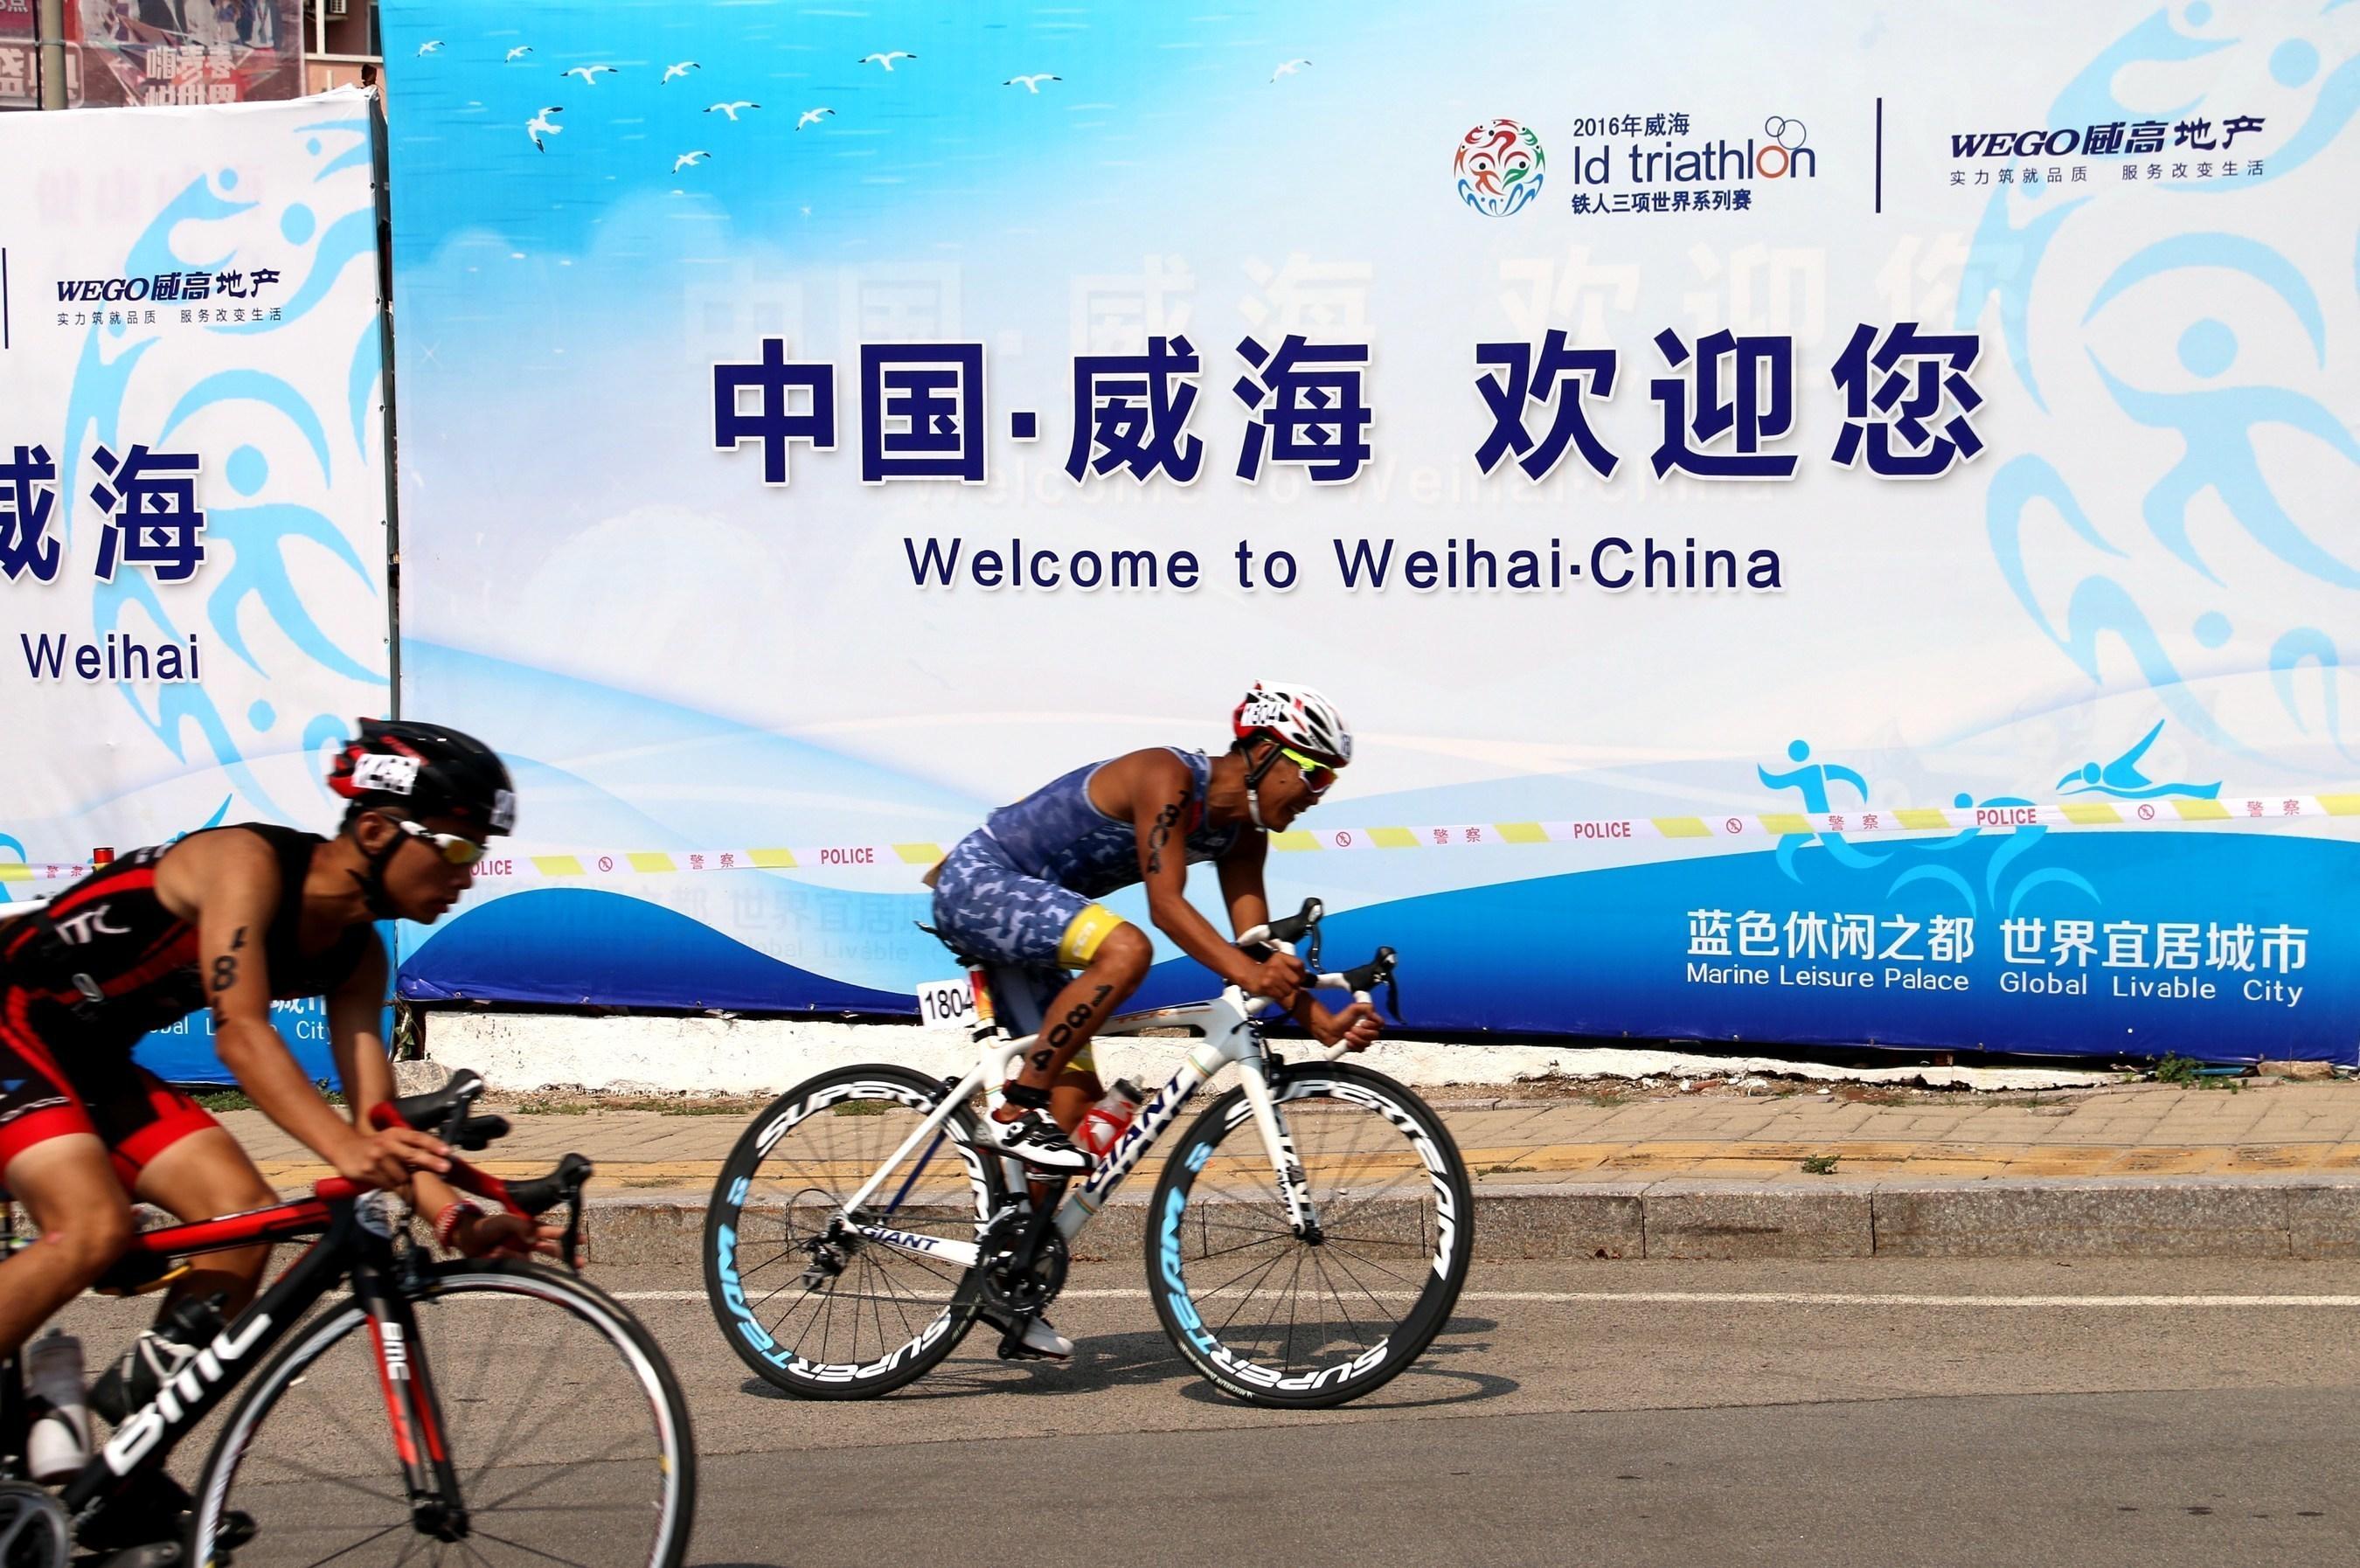 The Biking Course of 2016 Weihai Long Distance Triathlon